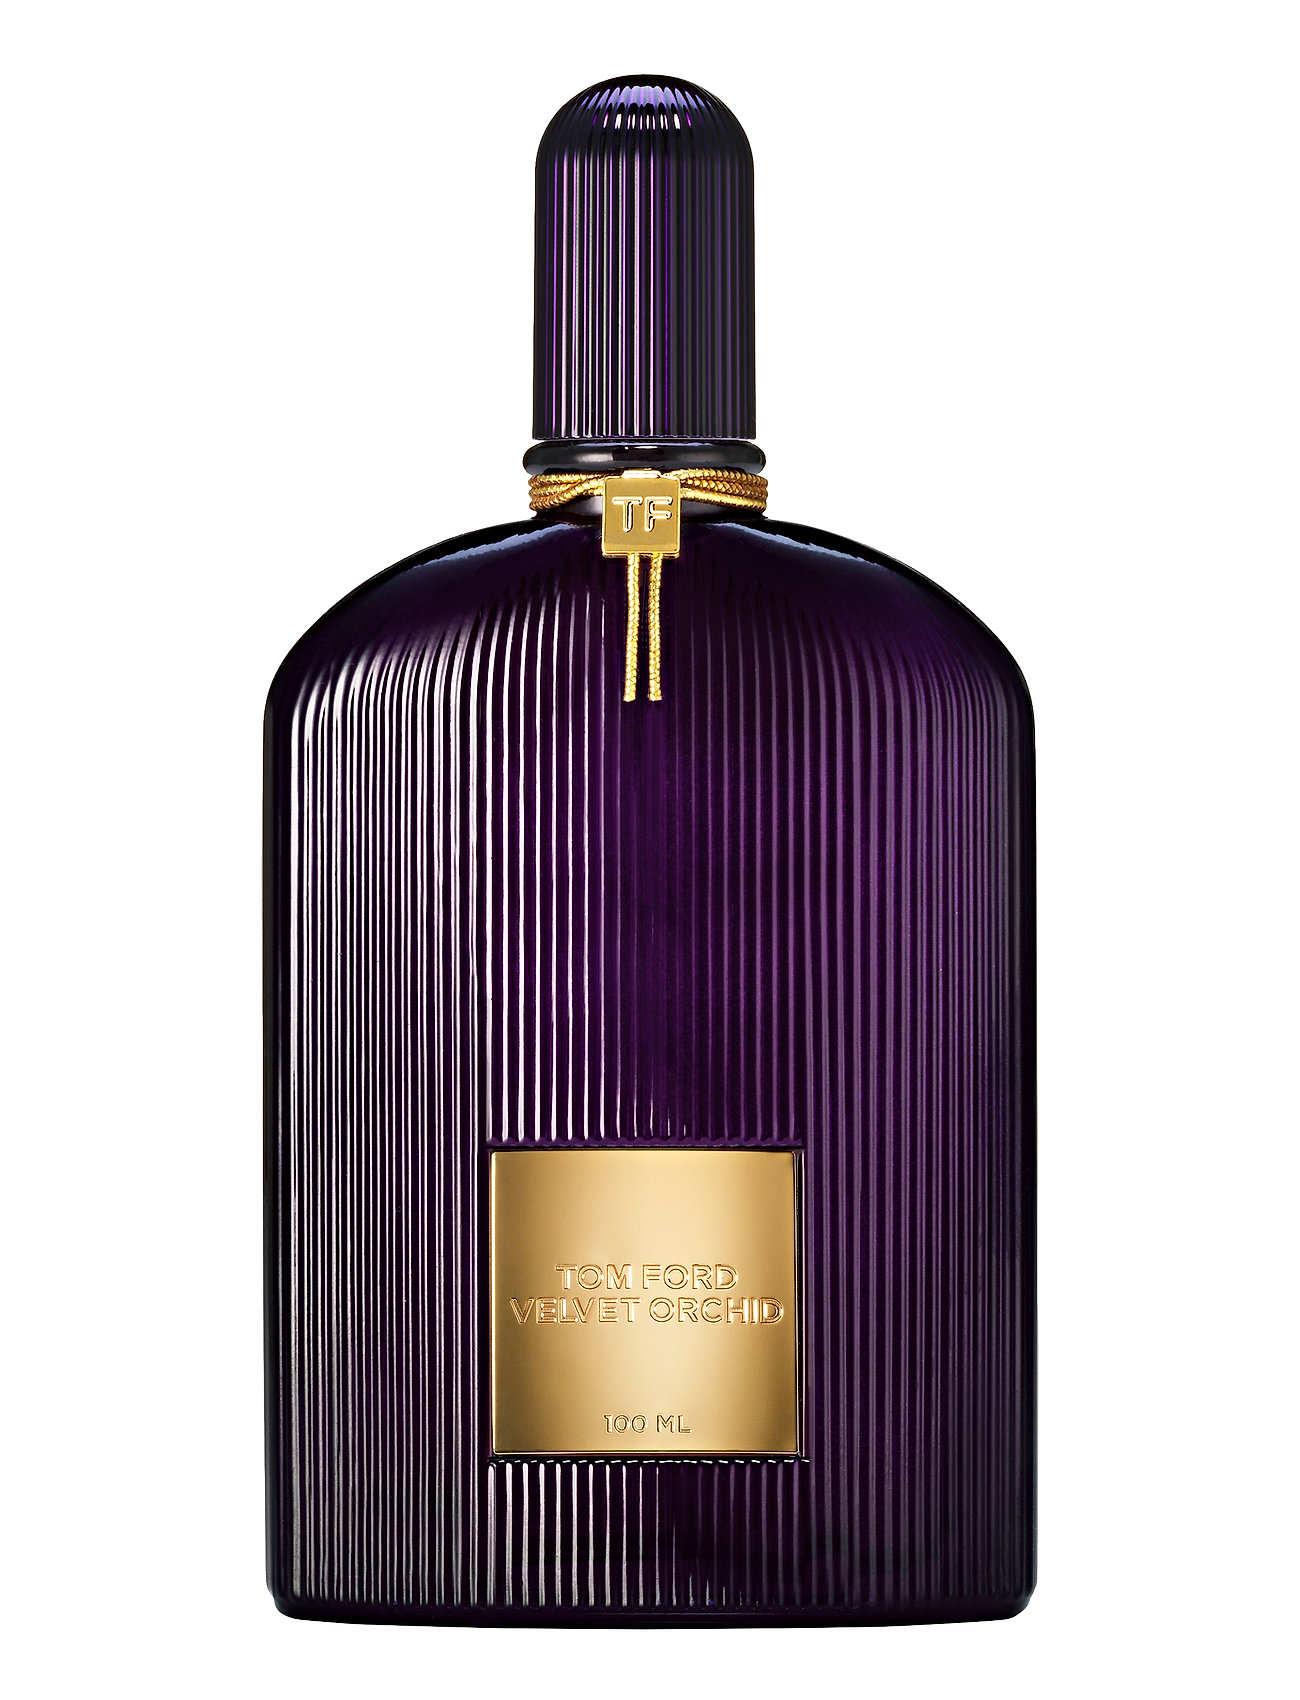 tom ford – Velvet orchid eau de parfum på boozt.com dk